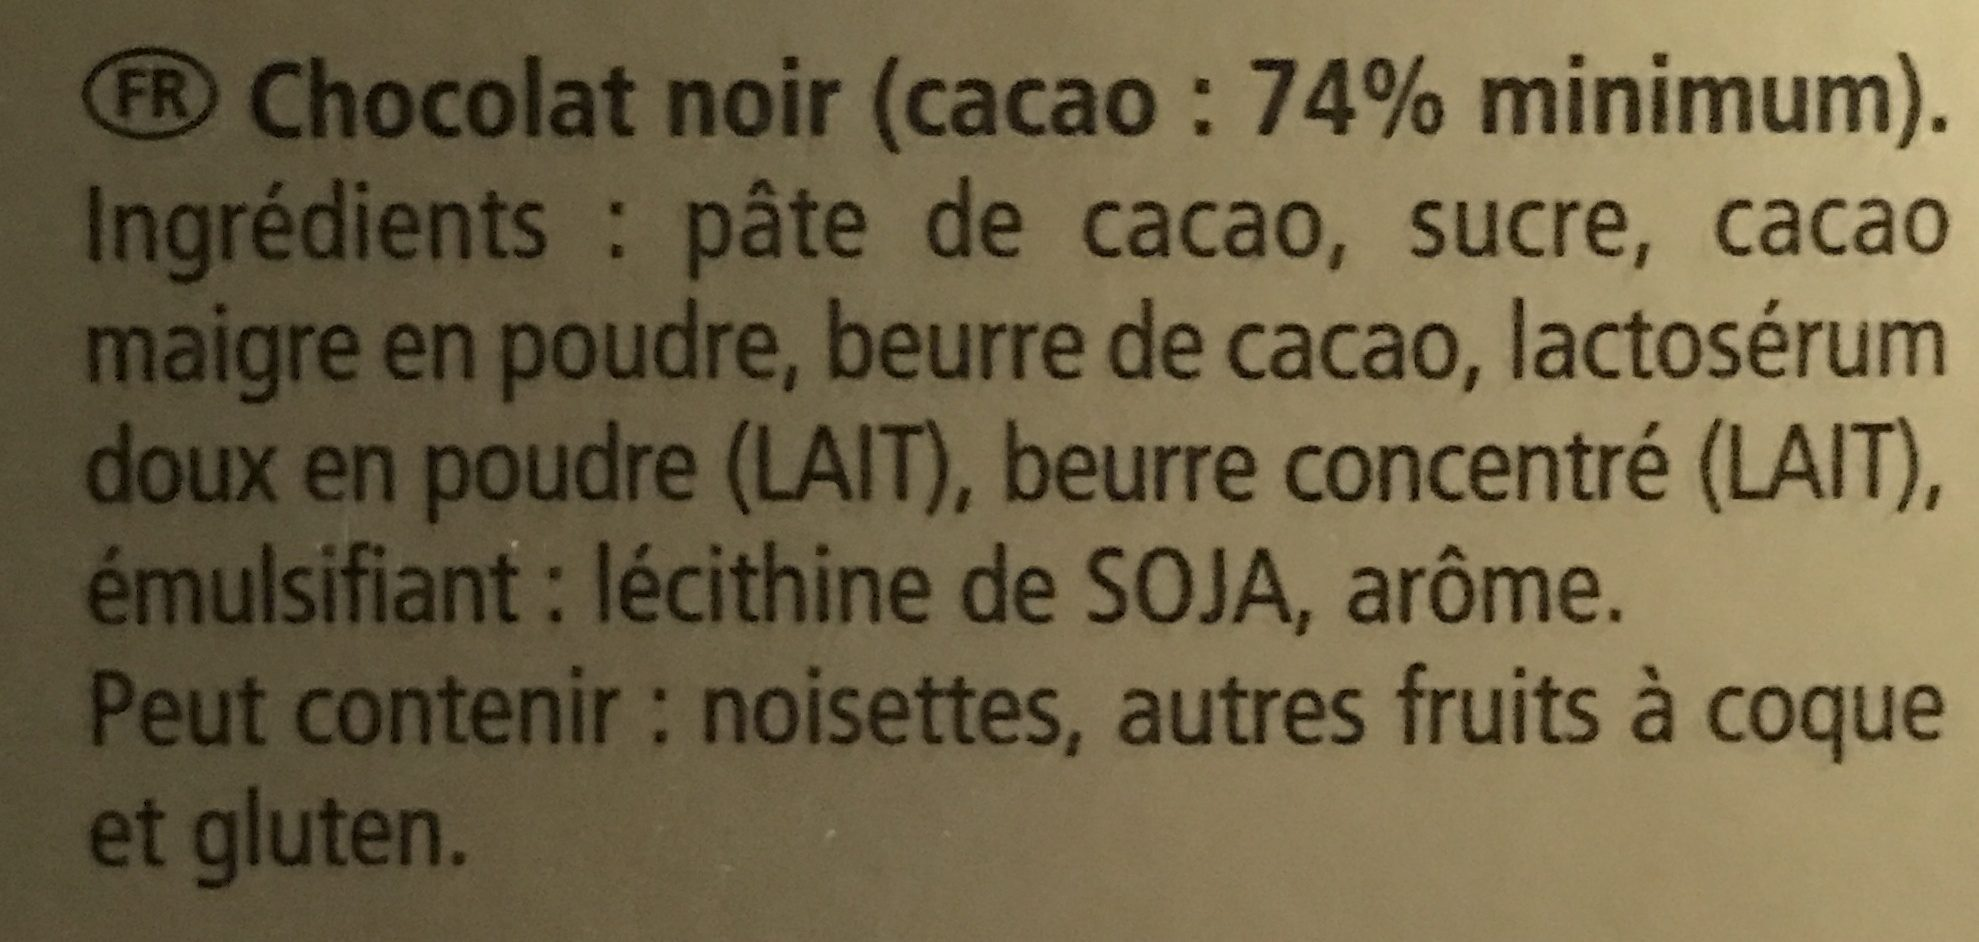 Chocolat noir - Ingredients